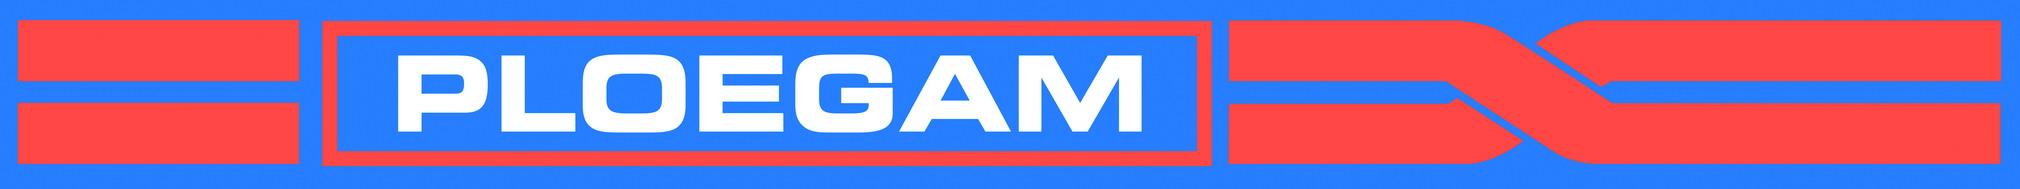 logo-ploegam